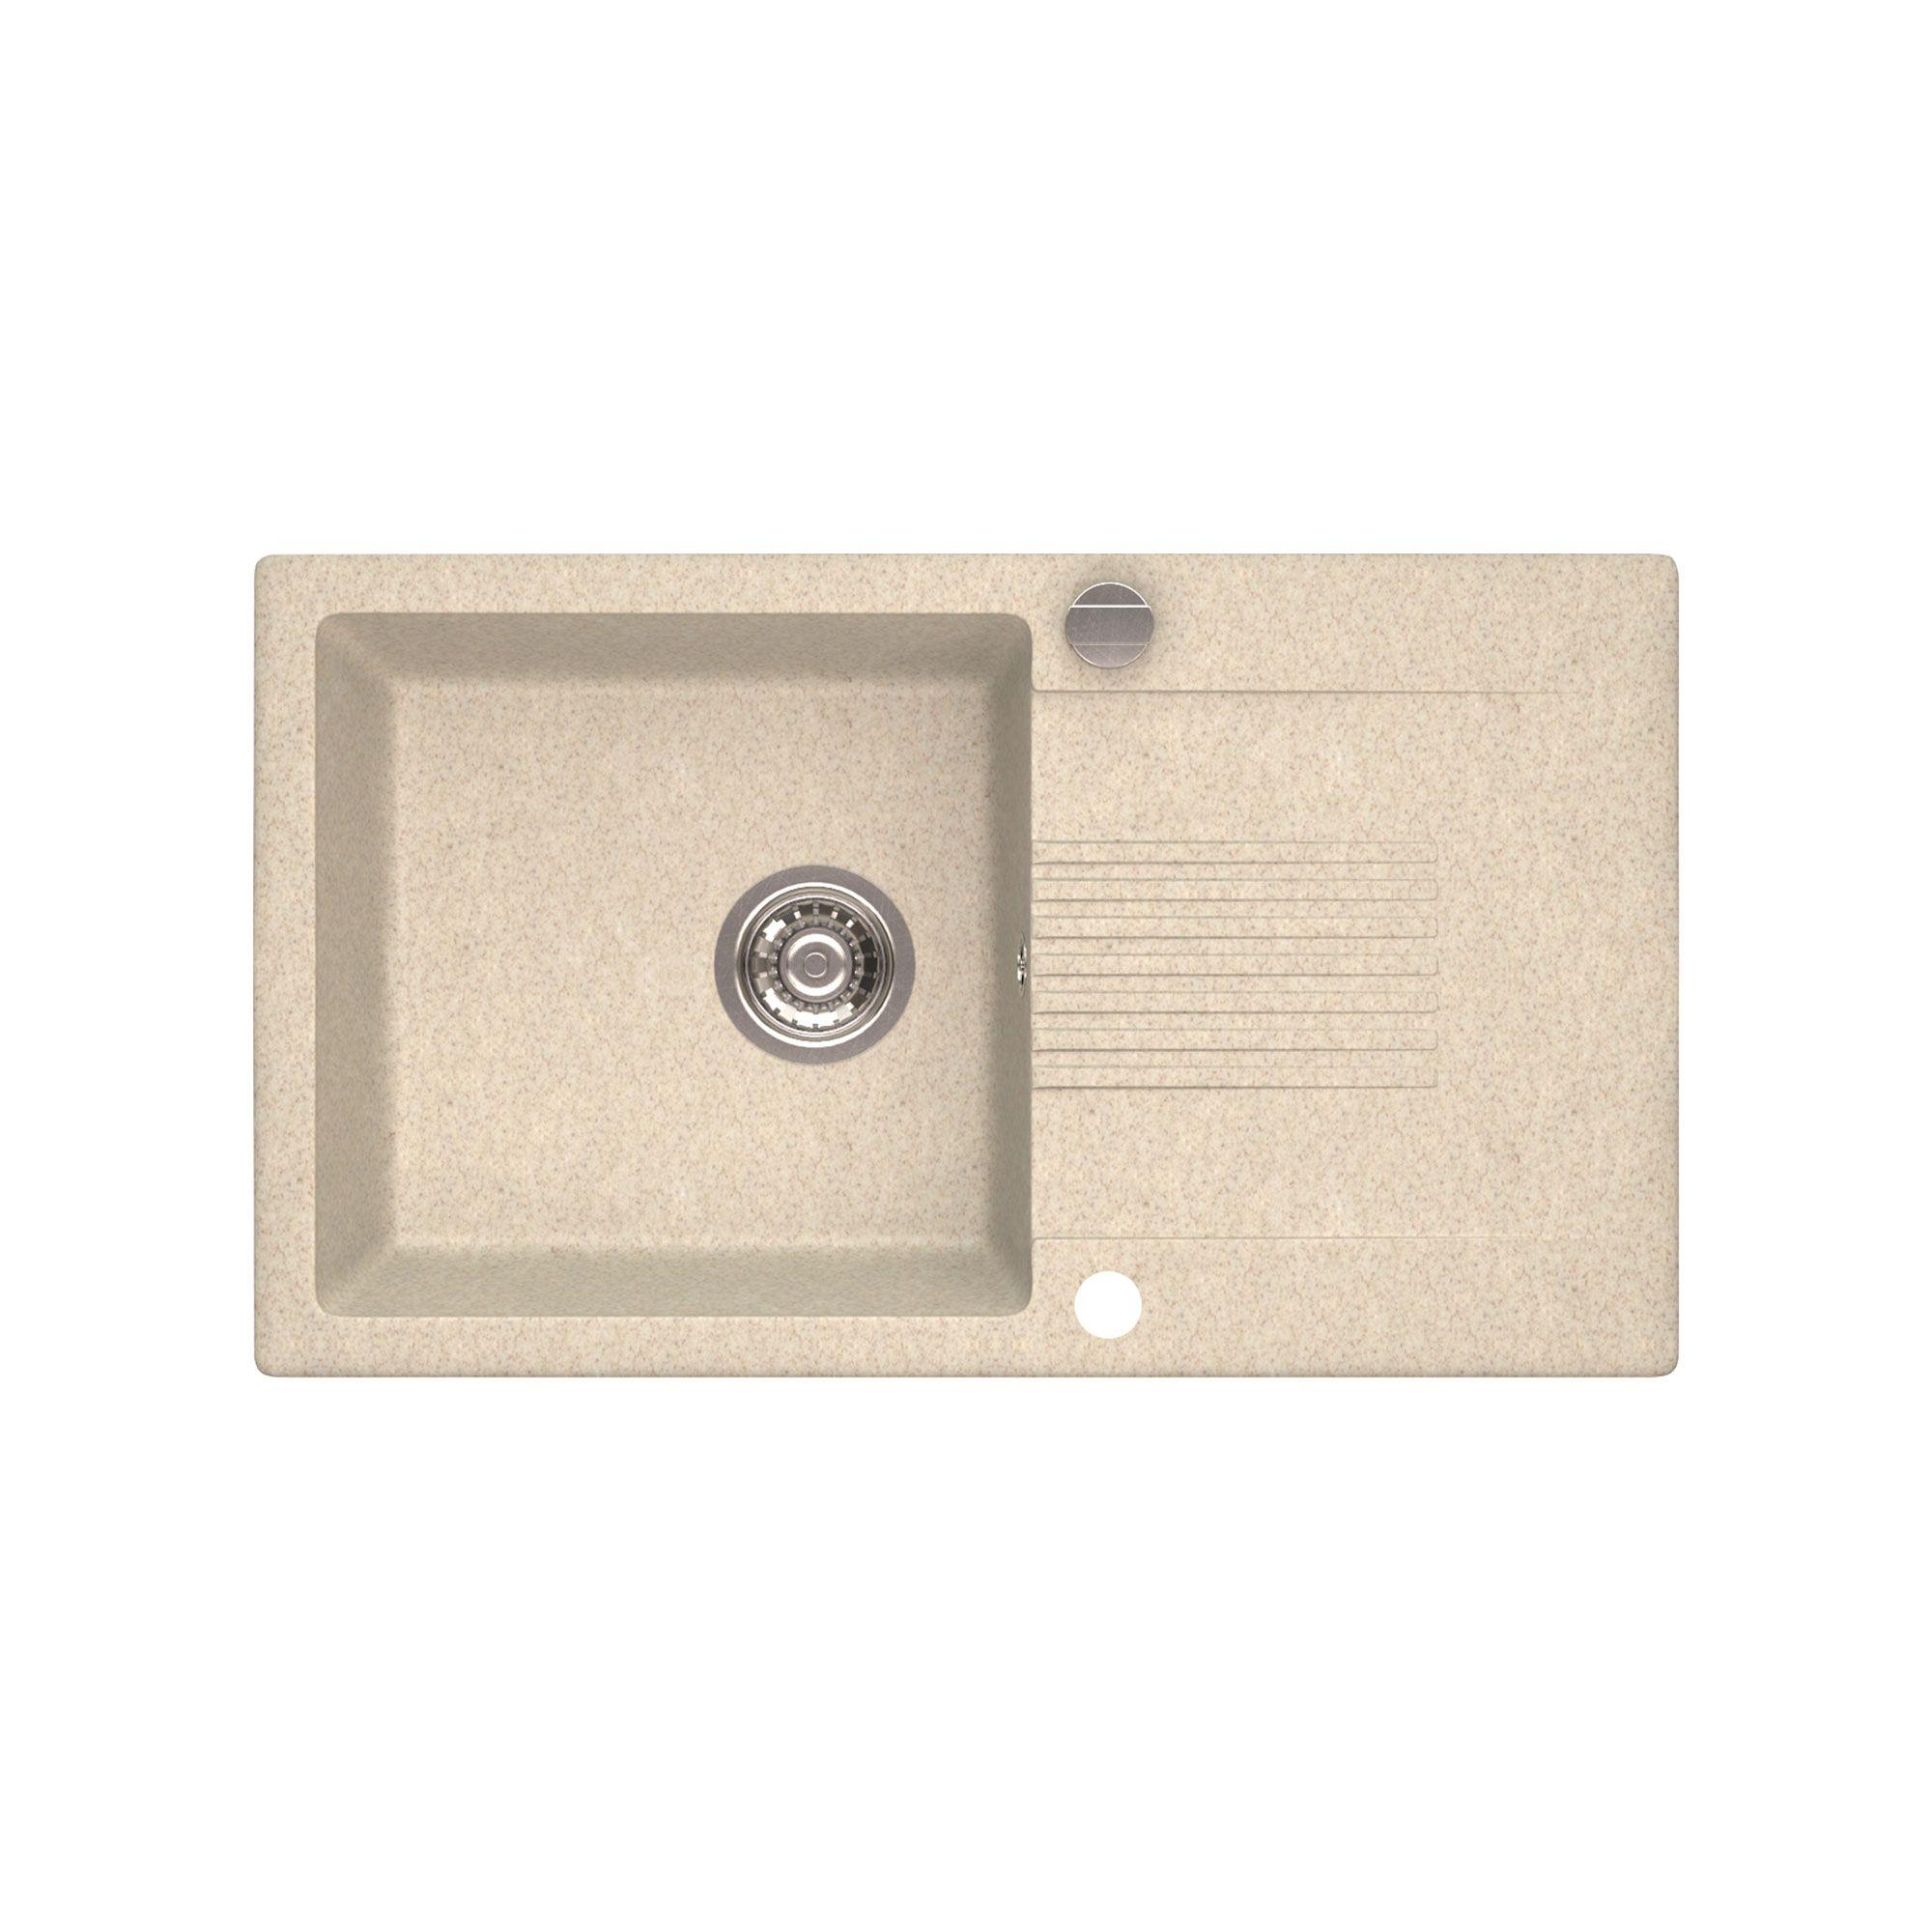 Chiuveta granit Celia bej 76 x 44 x 17 cm 1 cuva 1 picurator